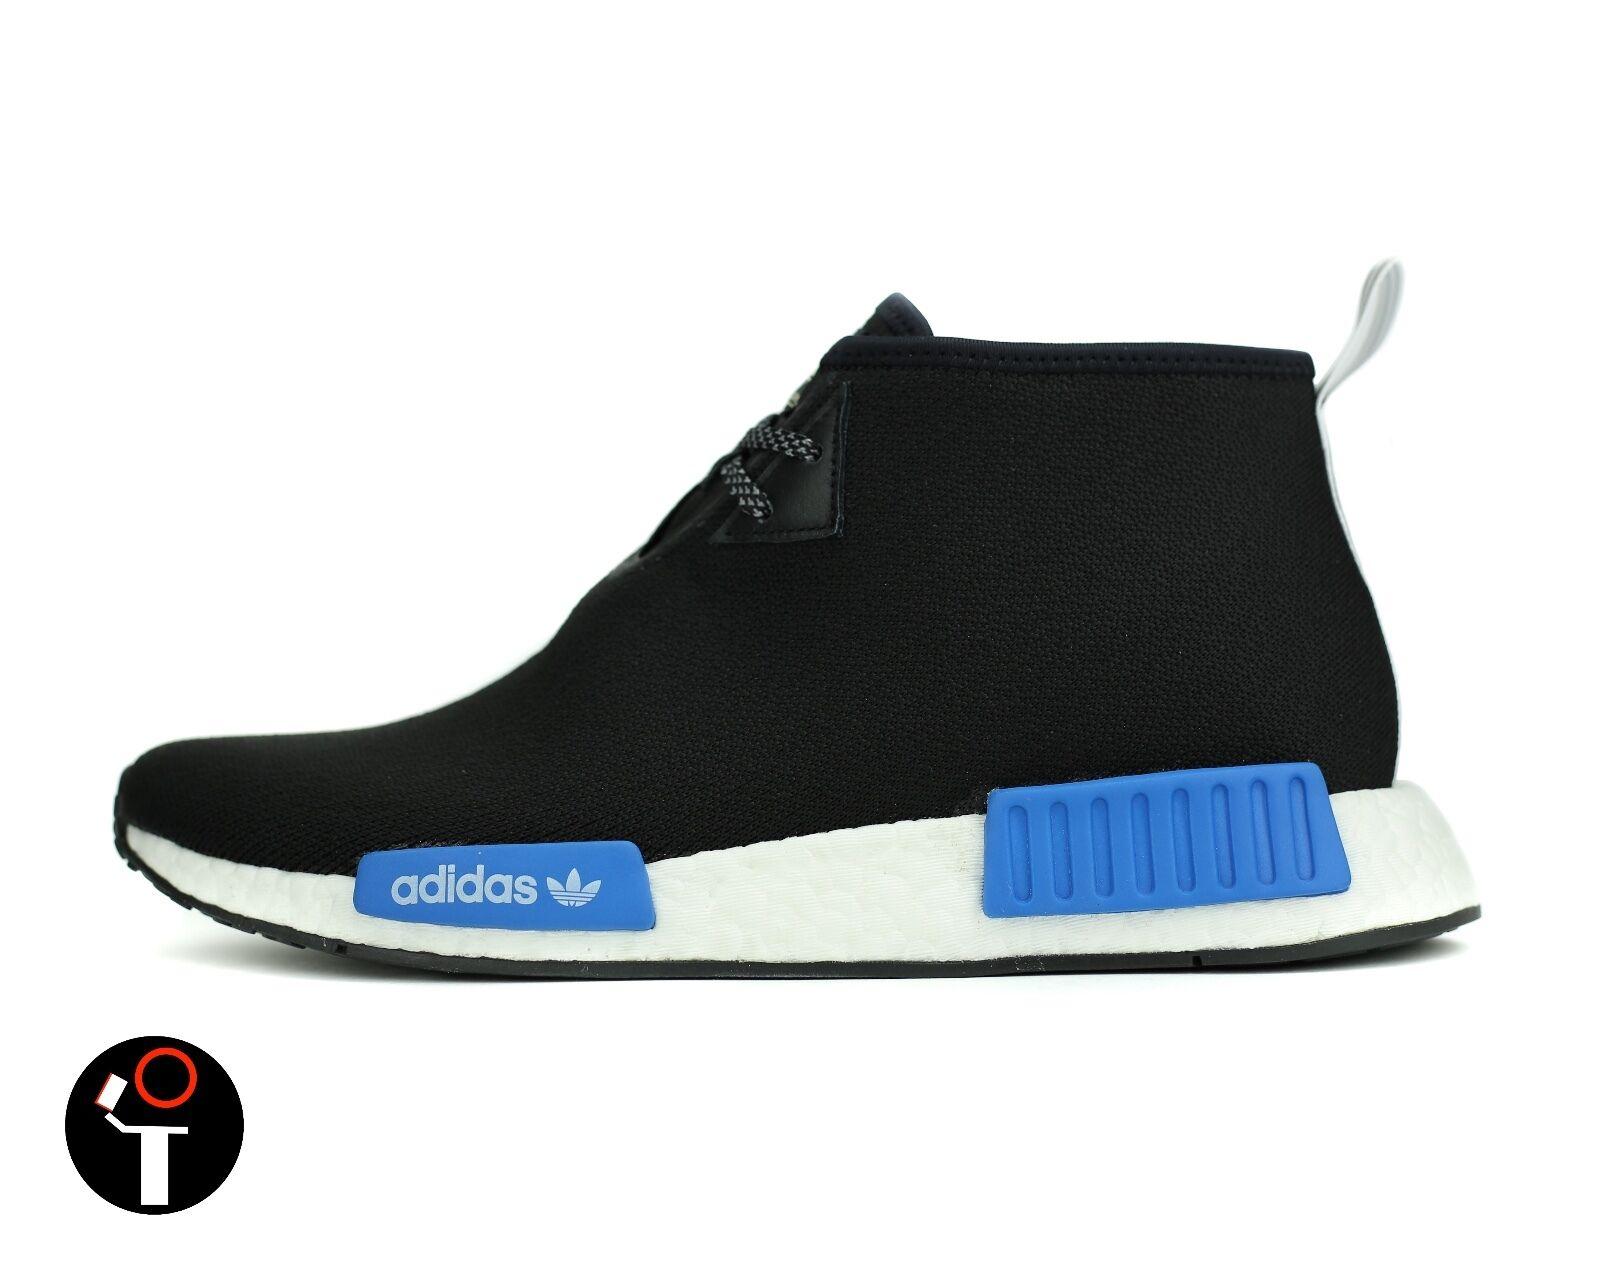 Adidas x porter nmd c1 nero bianco e blu cp9718 giappone 7 - 13 - chukka citt sock impulso